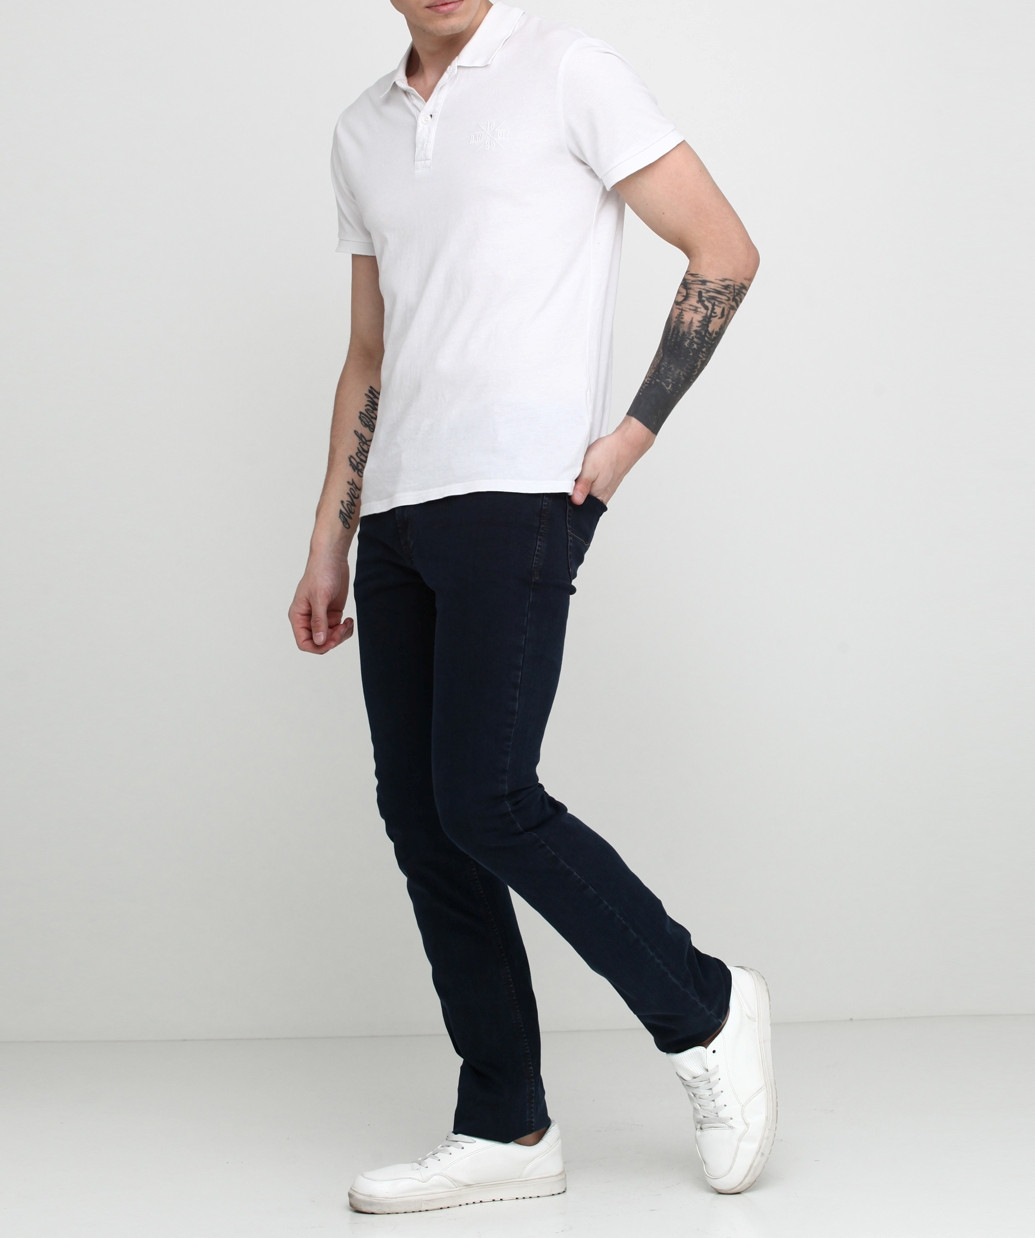 Мужские джинсы Pioneer 30/34 Синий (P-8-013)